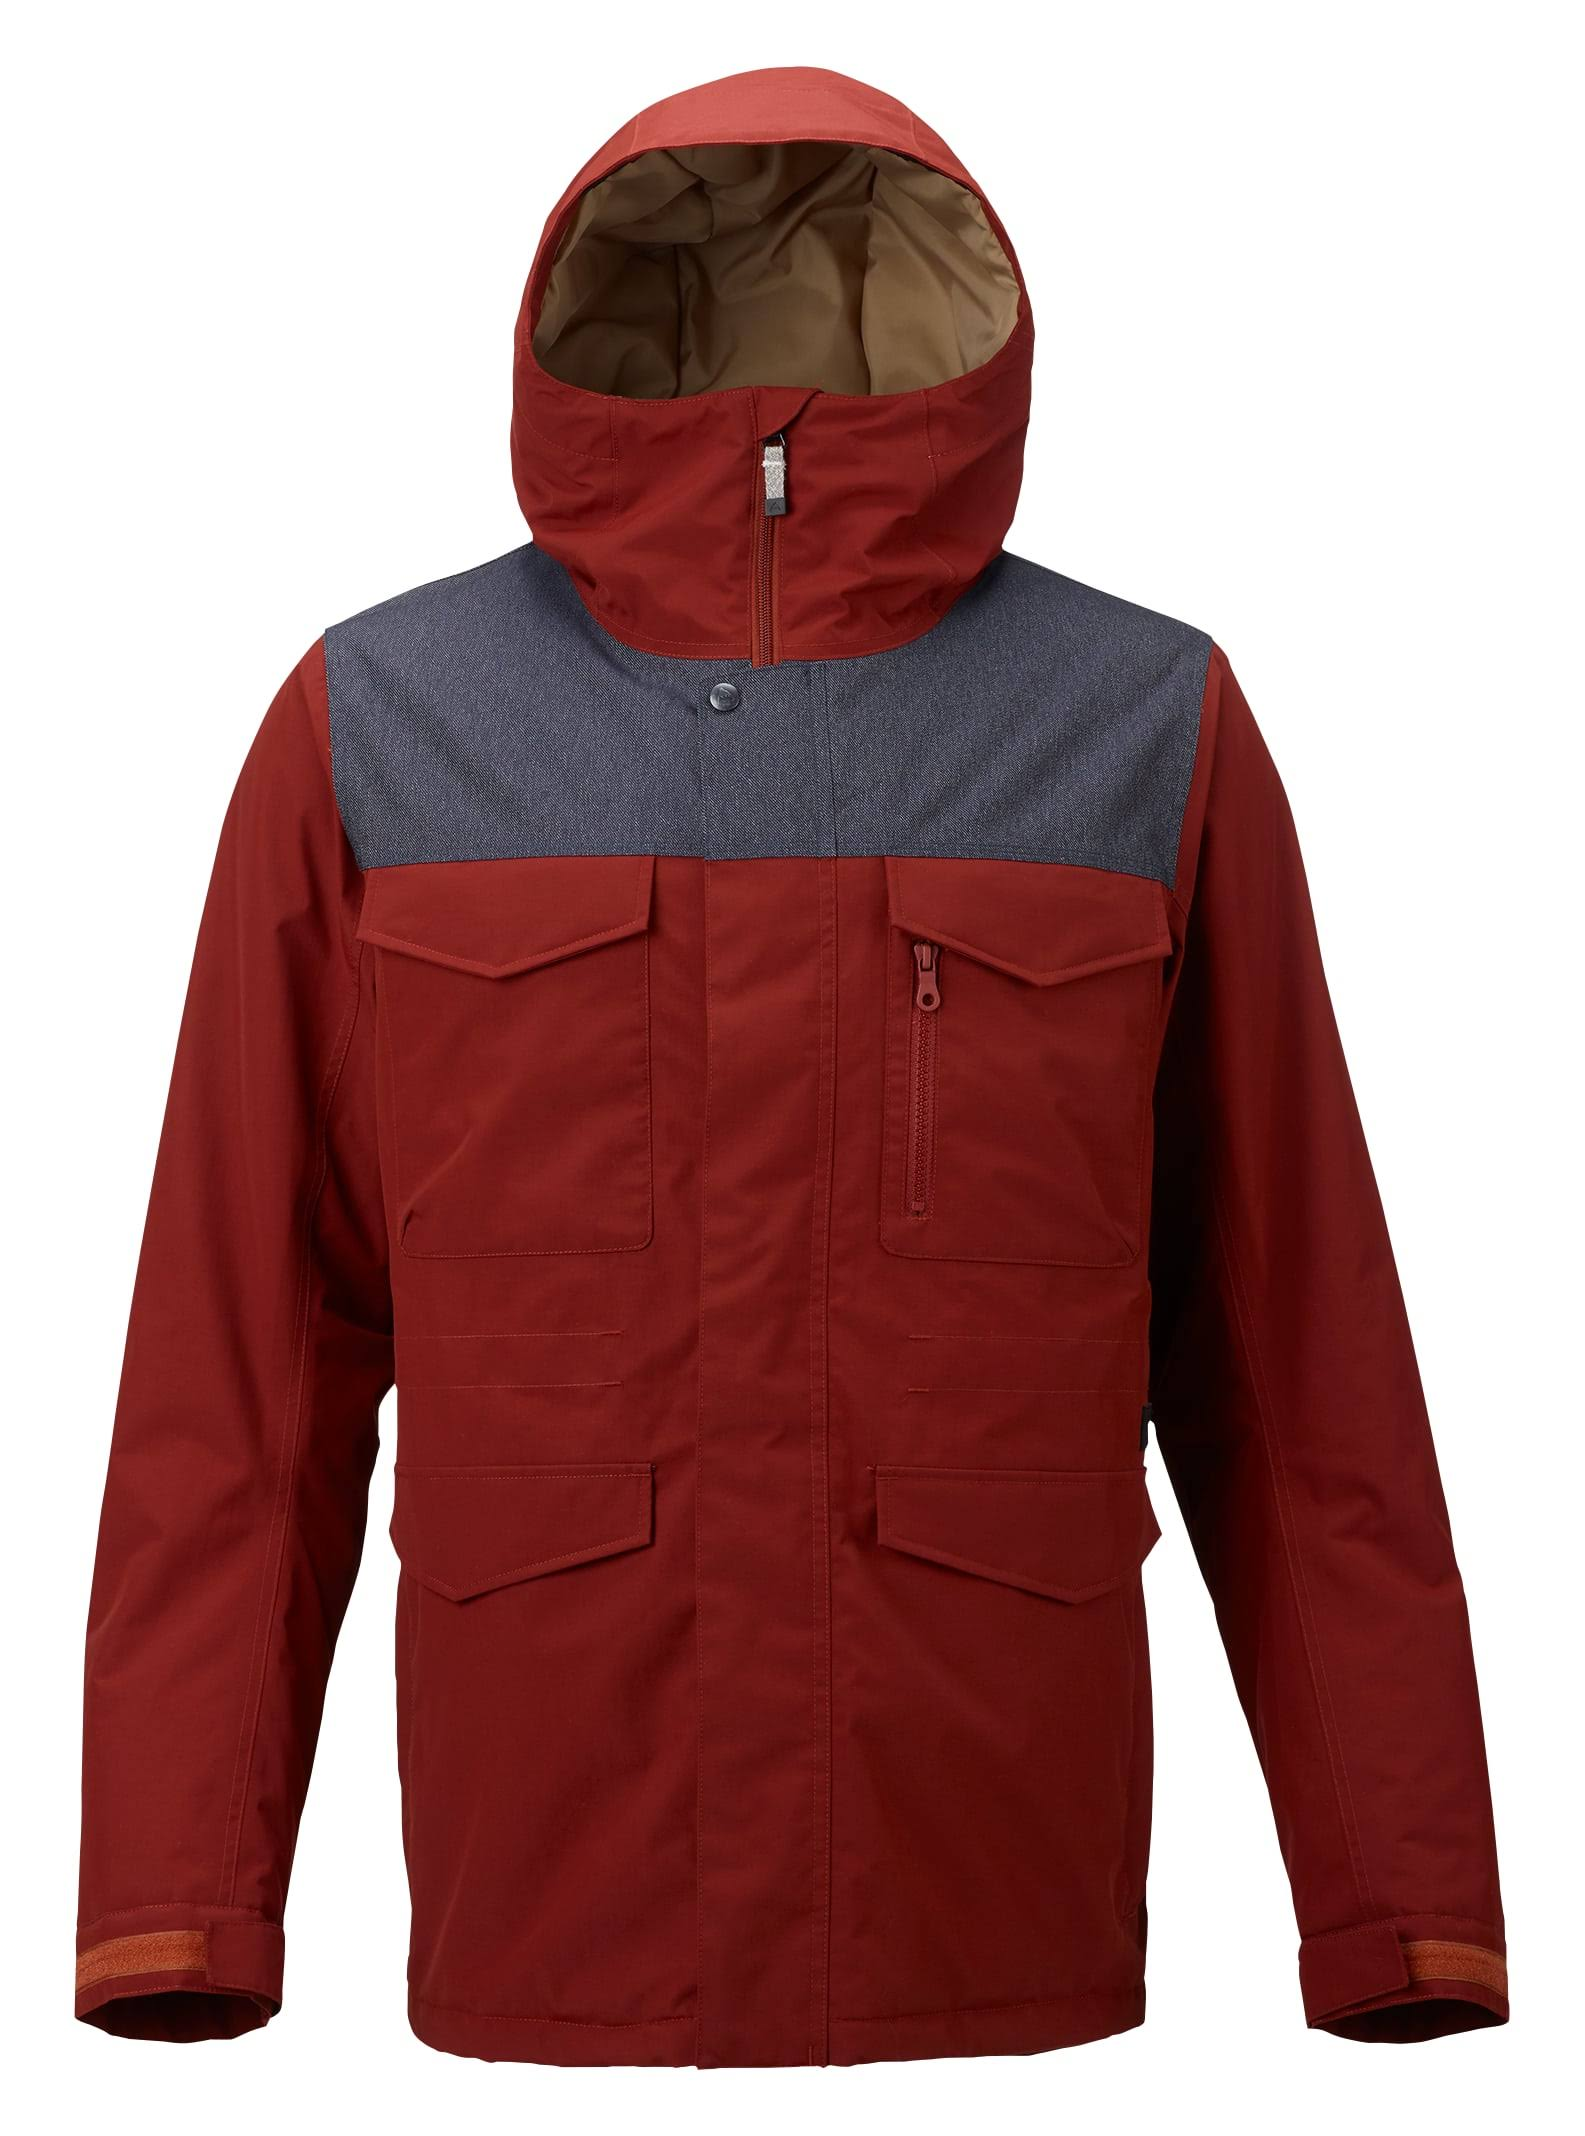 Hombres Hombres Jacket Por Covert Jacket Burton Burton Covert PwTqfTx